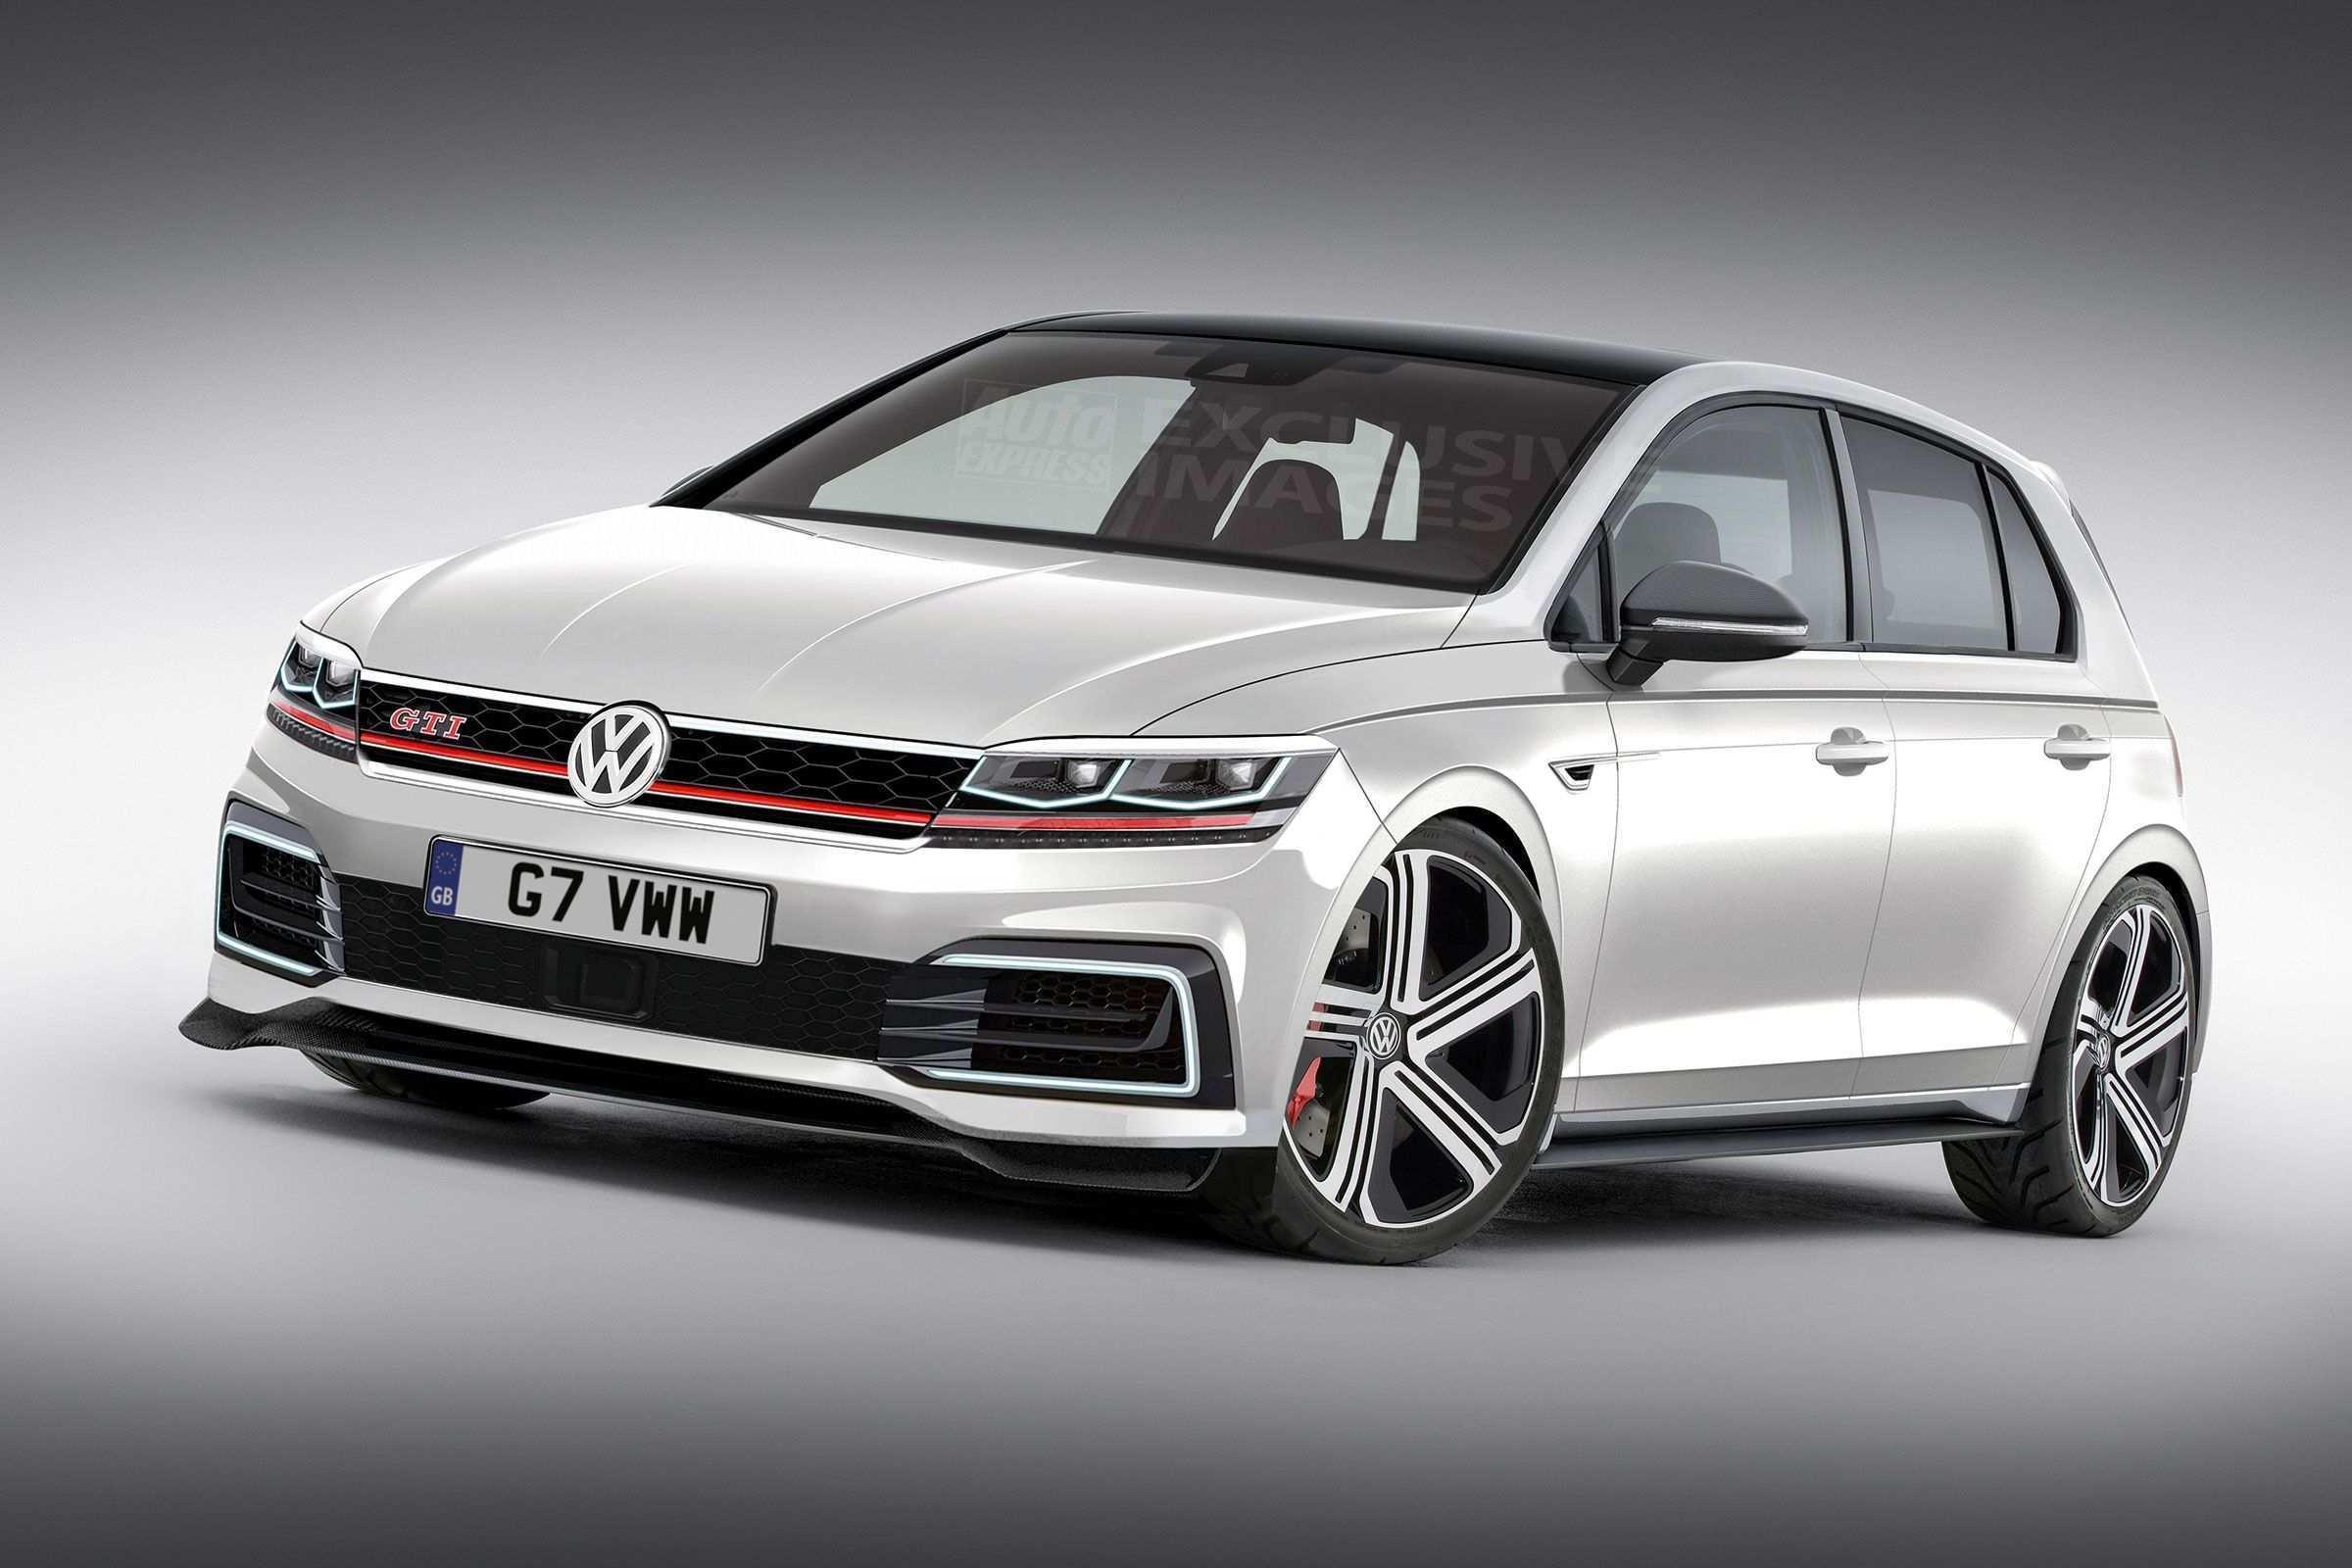 82 Best Review 2020 Volkswagen Golf GTD Overview by 2020 Volkswagen Golf GTD